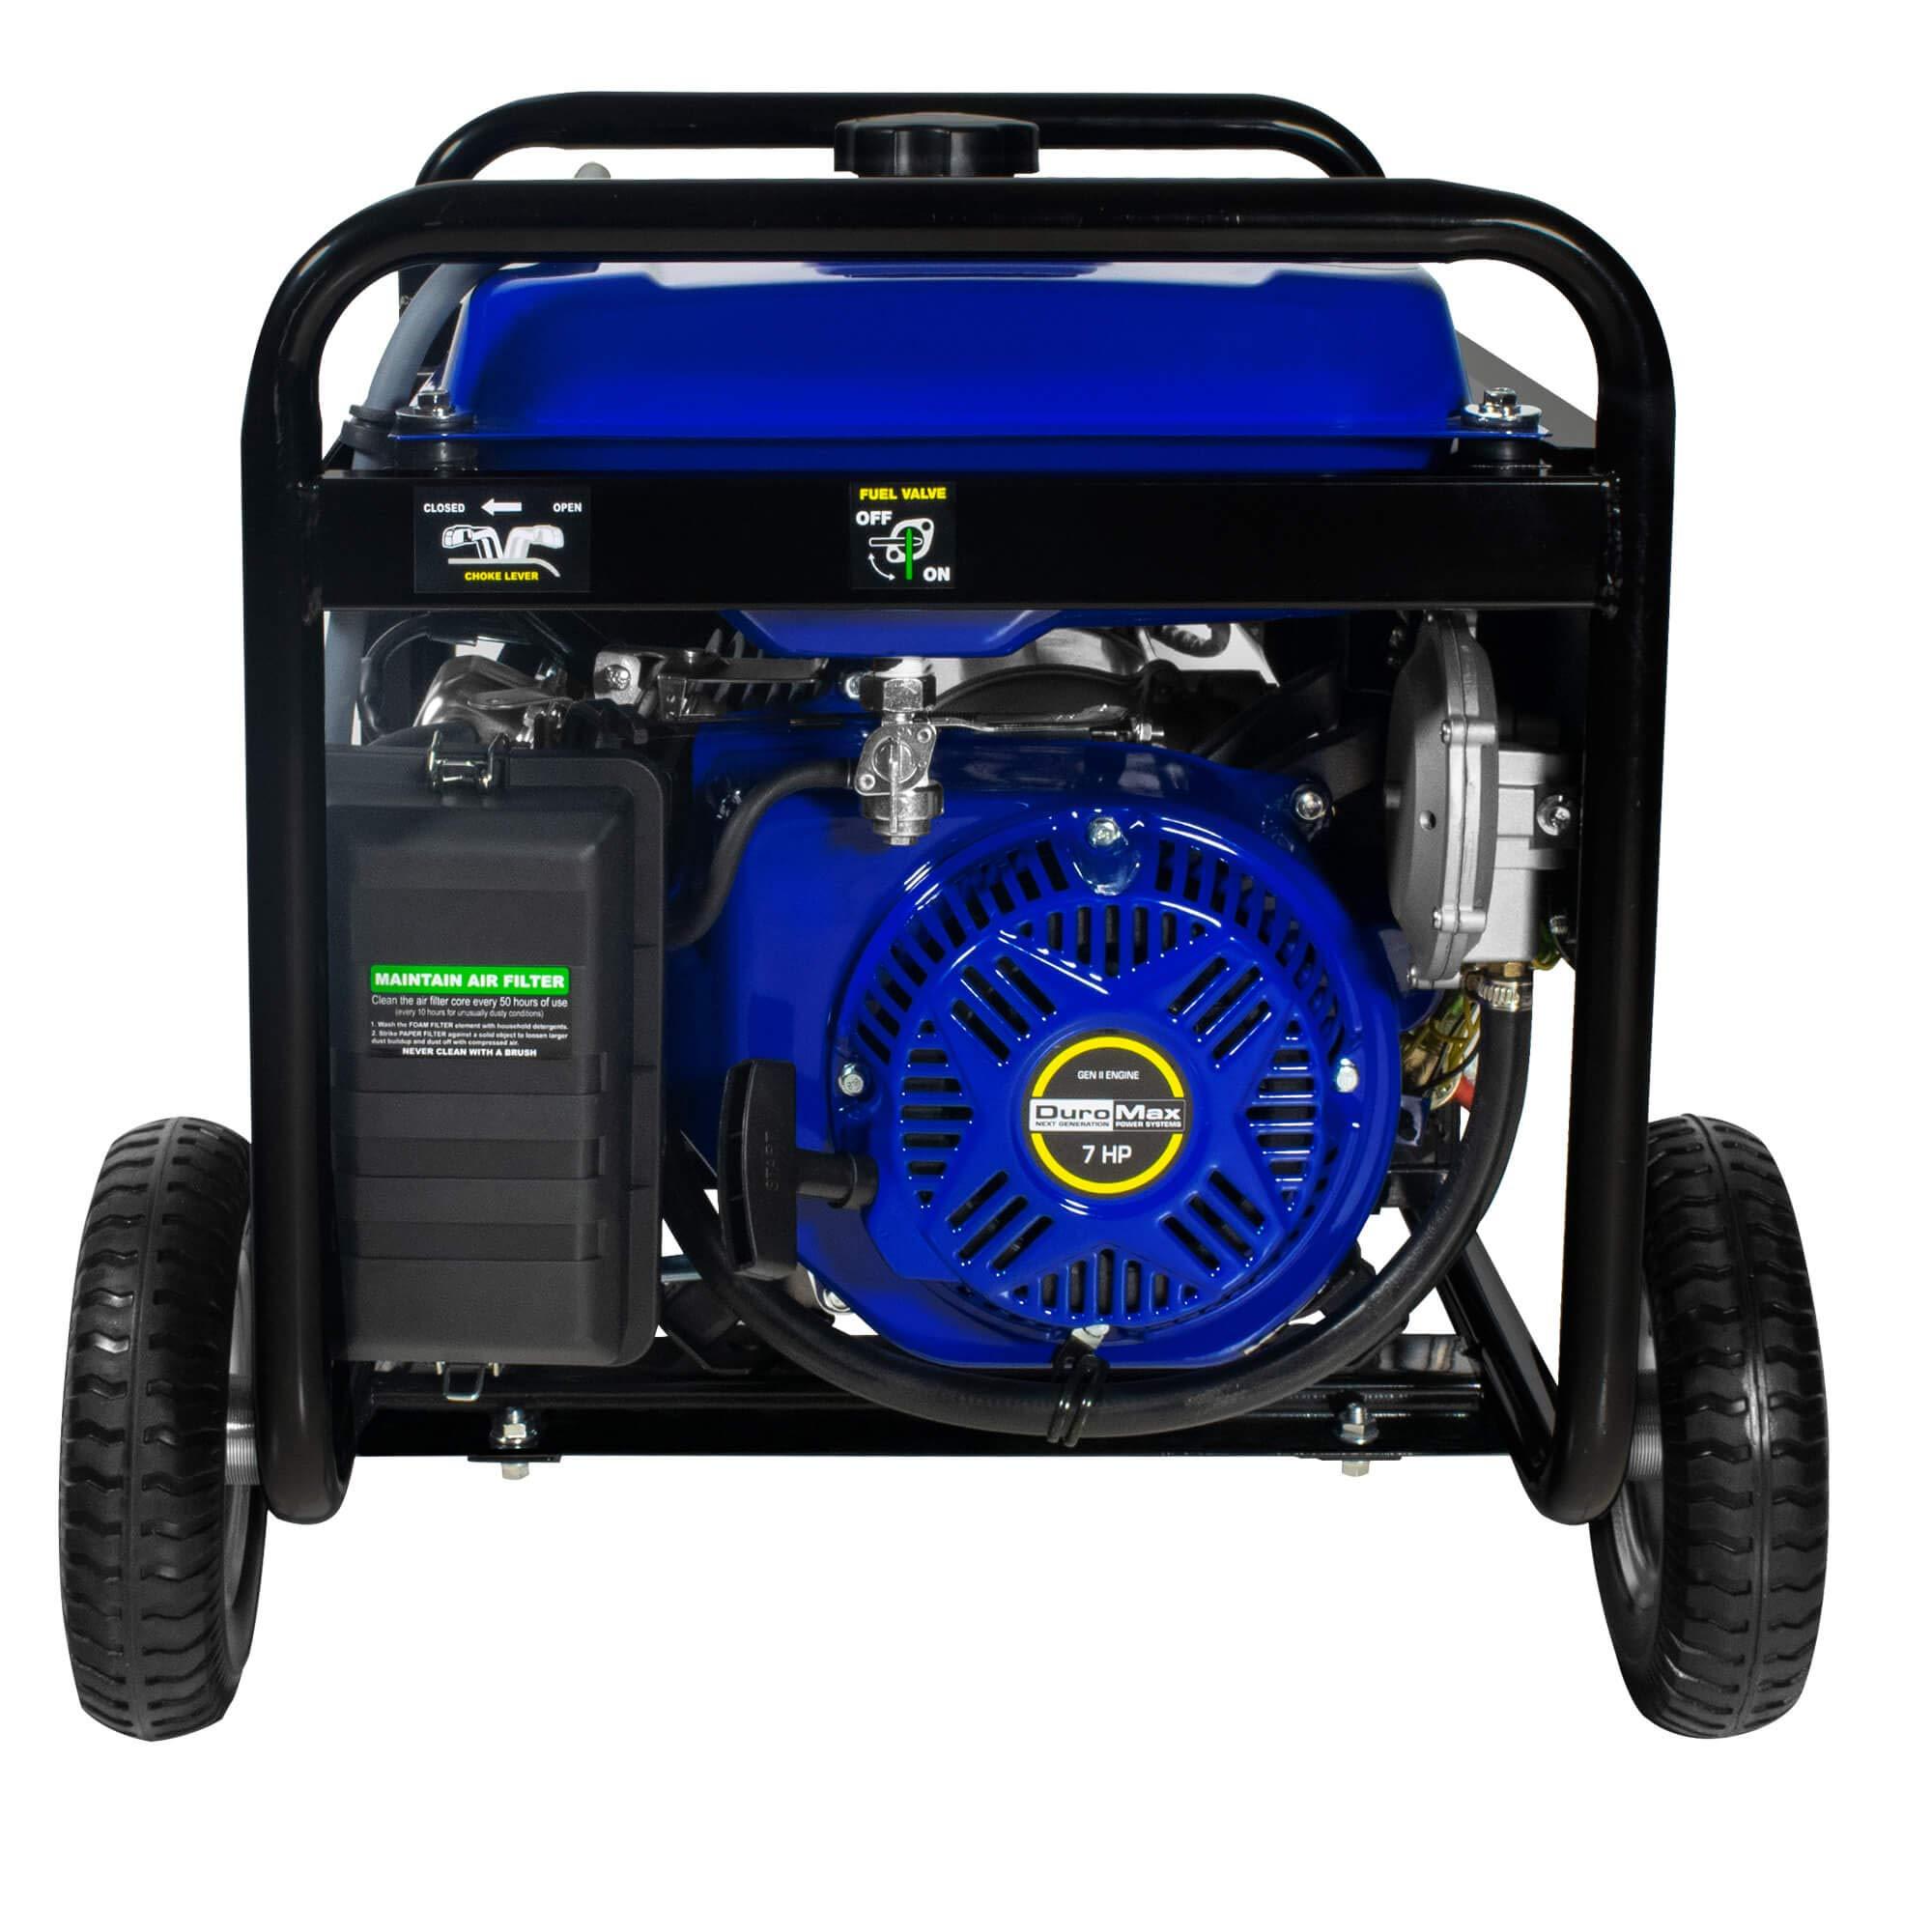 DuroMax Hybrid Dual Fuel XP4400EH 4,400-Watt Portable Generator by DuroMax (Image #6)